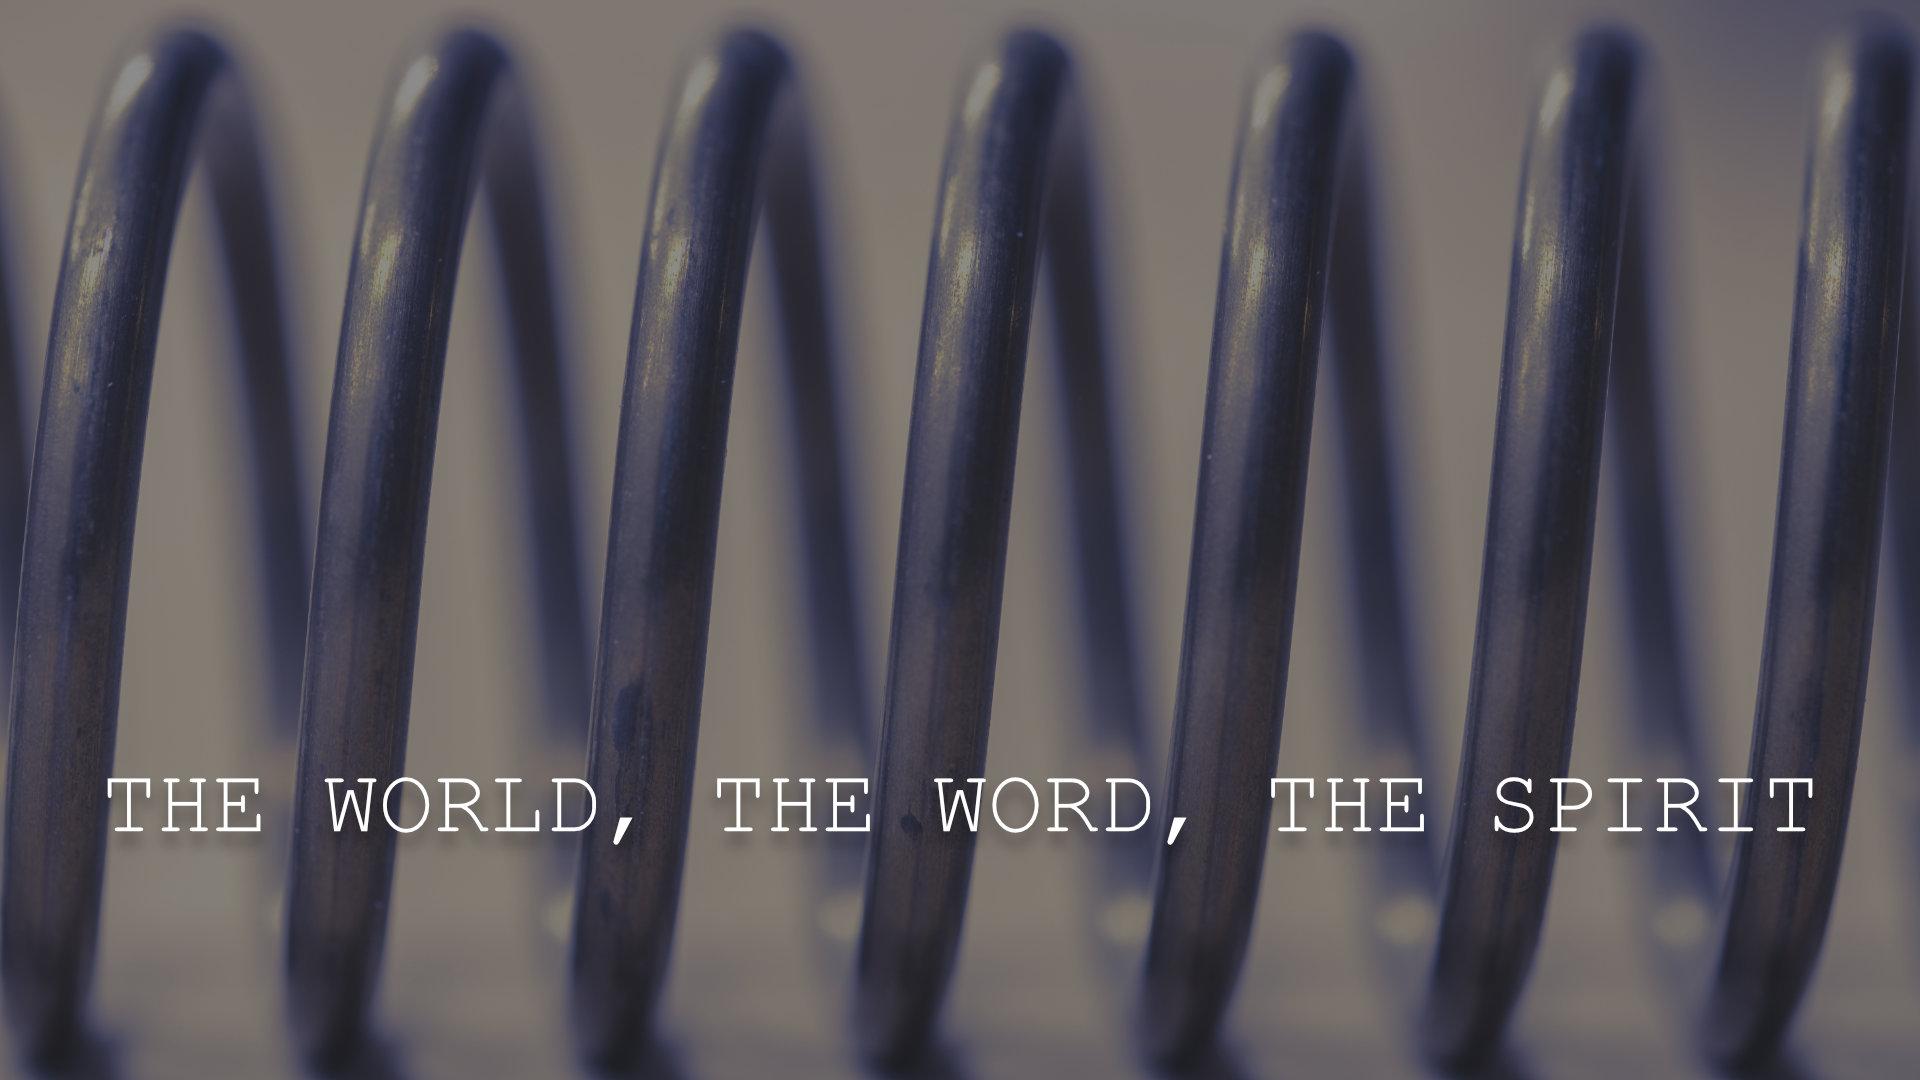 2019-06-09 The World The Word The Spirit.jpg